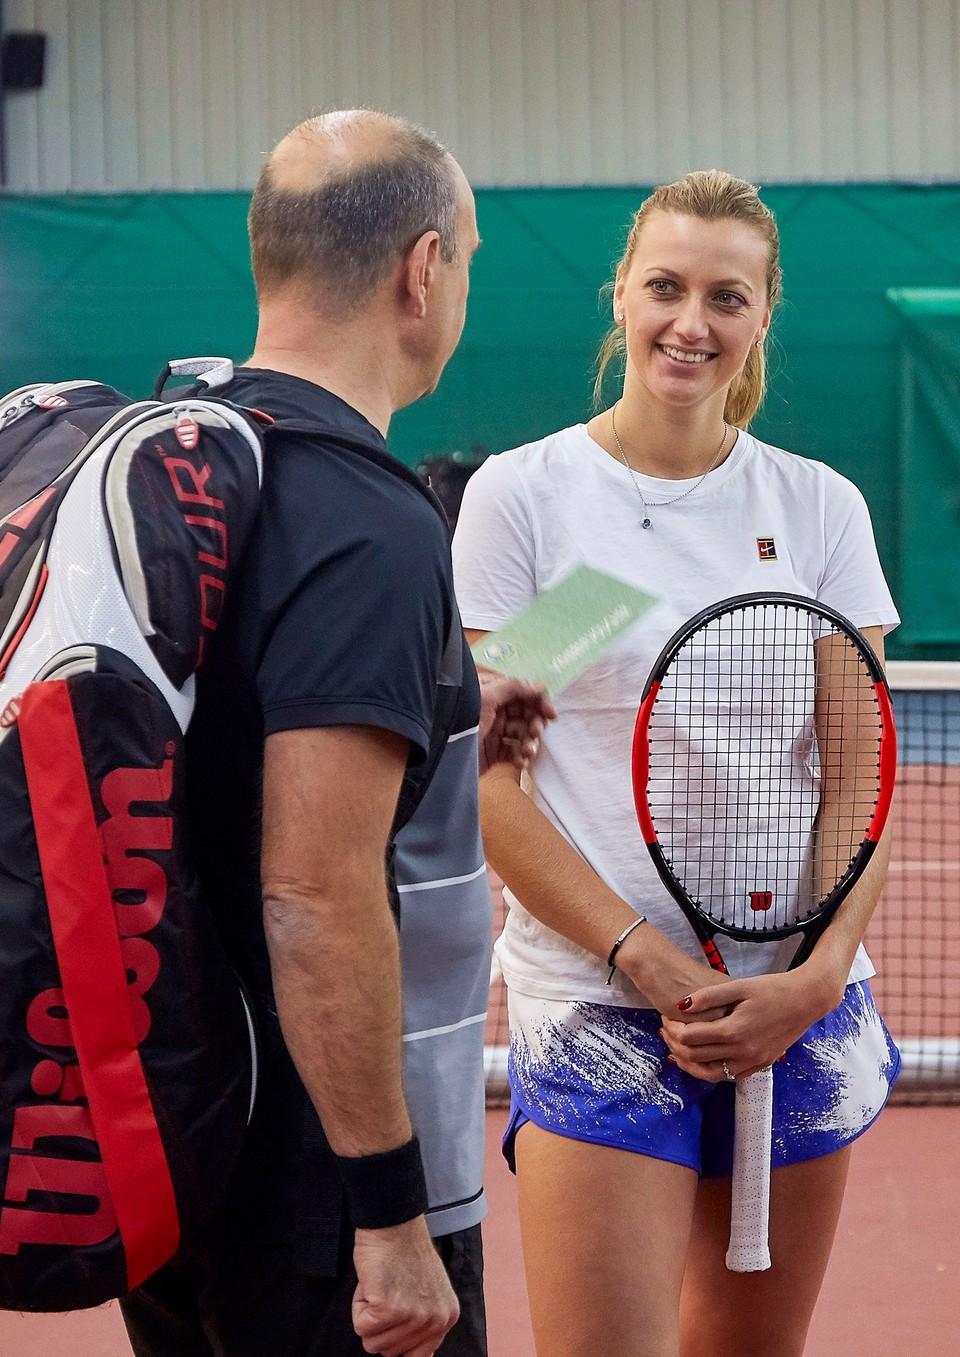 Tenistka Petra Kvitová hraje v Ordinaci sama sebe - 16